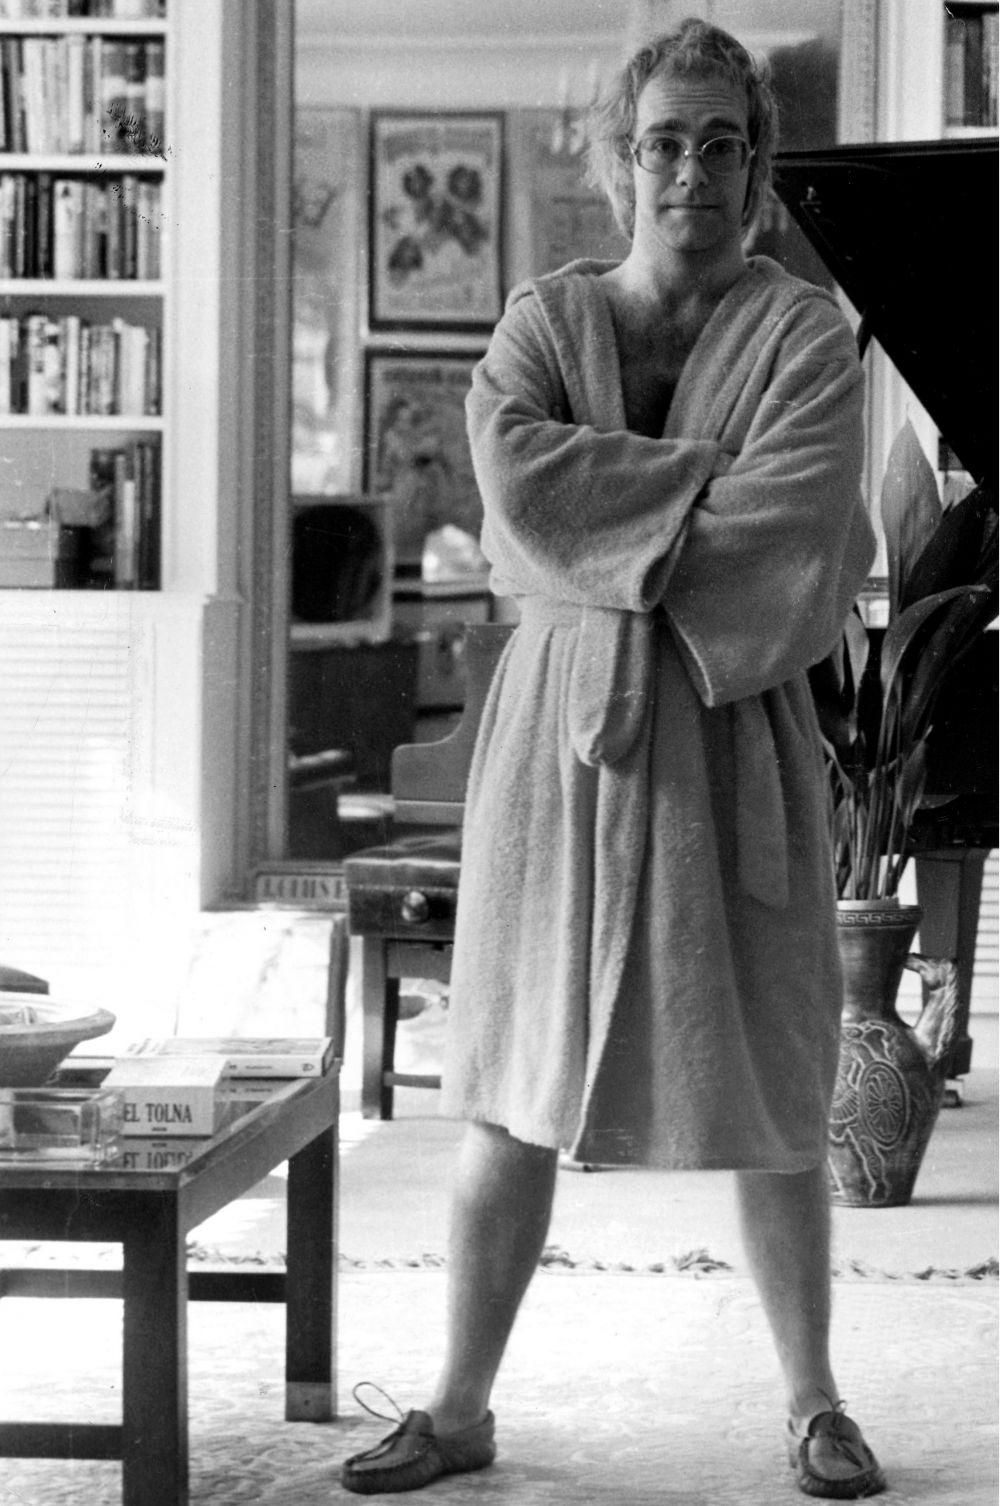 Музыкант у себя дома, 1973 год.